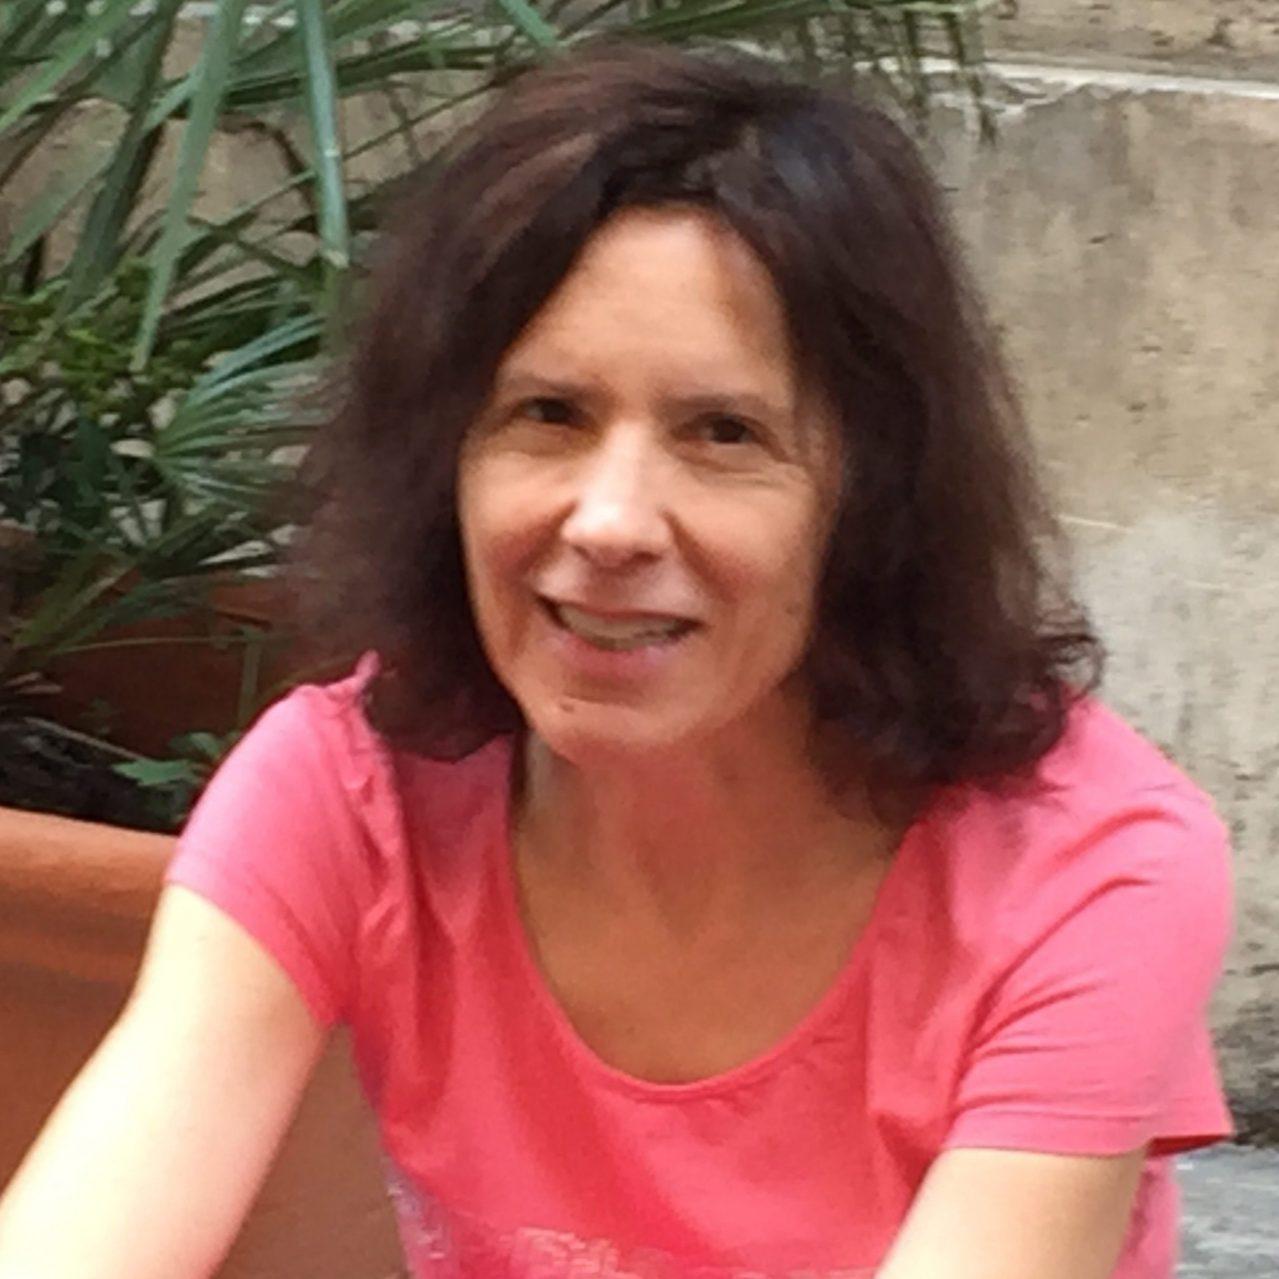 Dott.ssa Lucia Tombolini